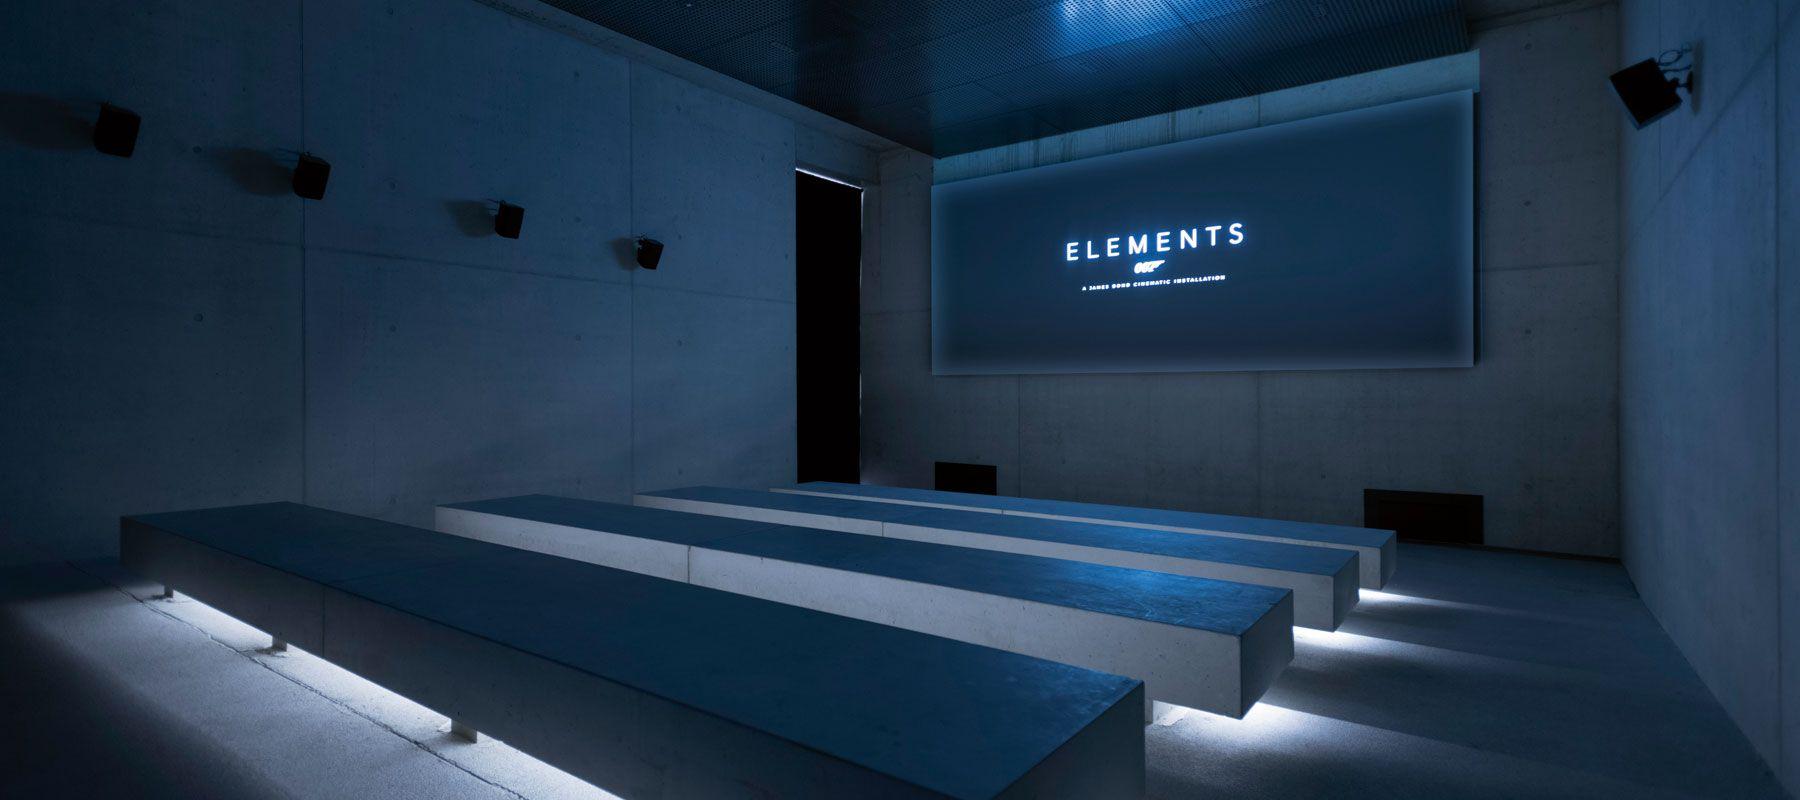 Falkner & Riml 007 Elements